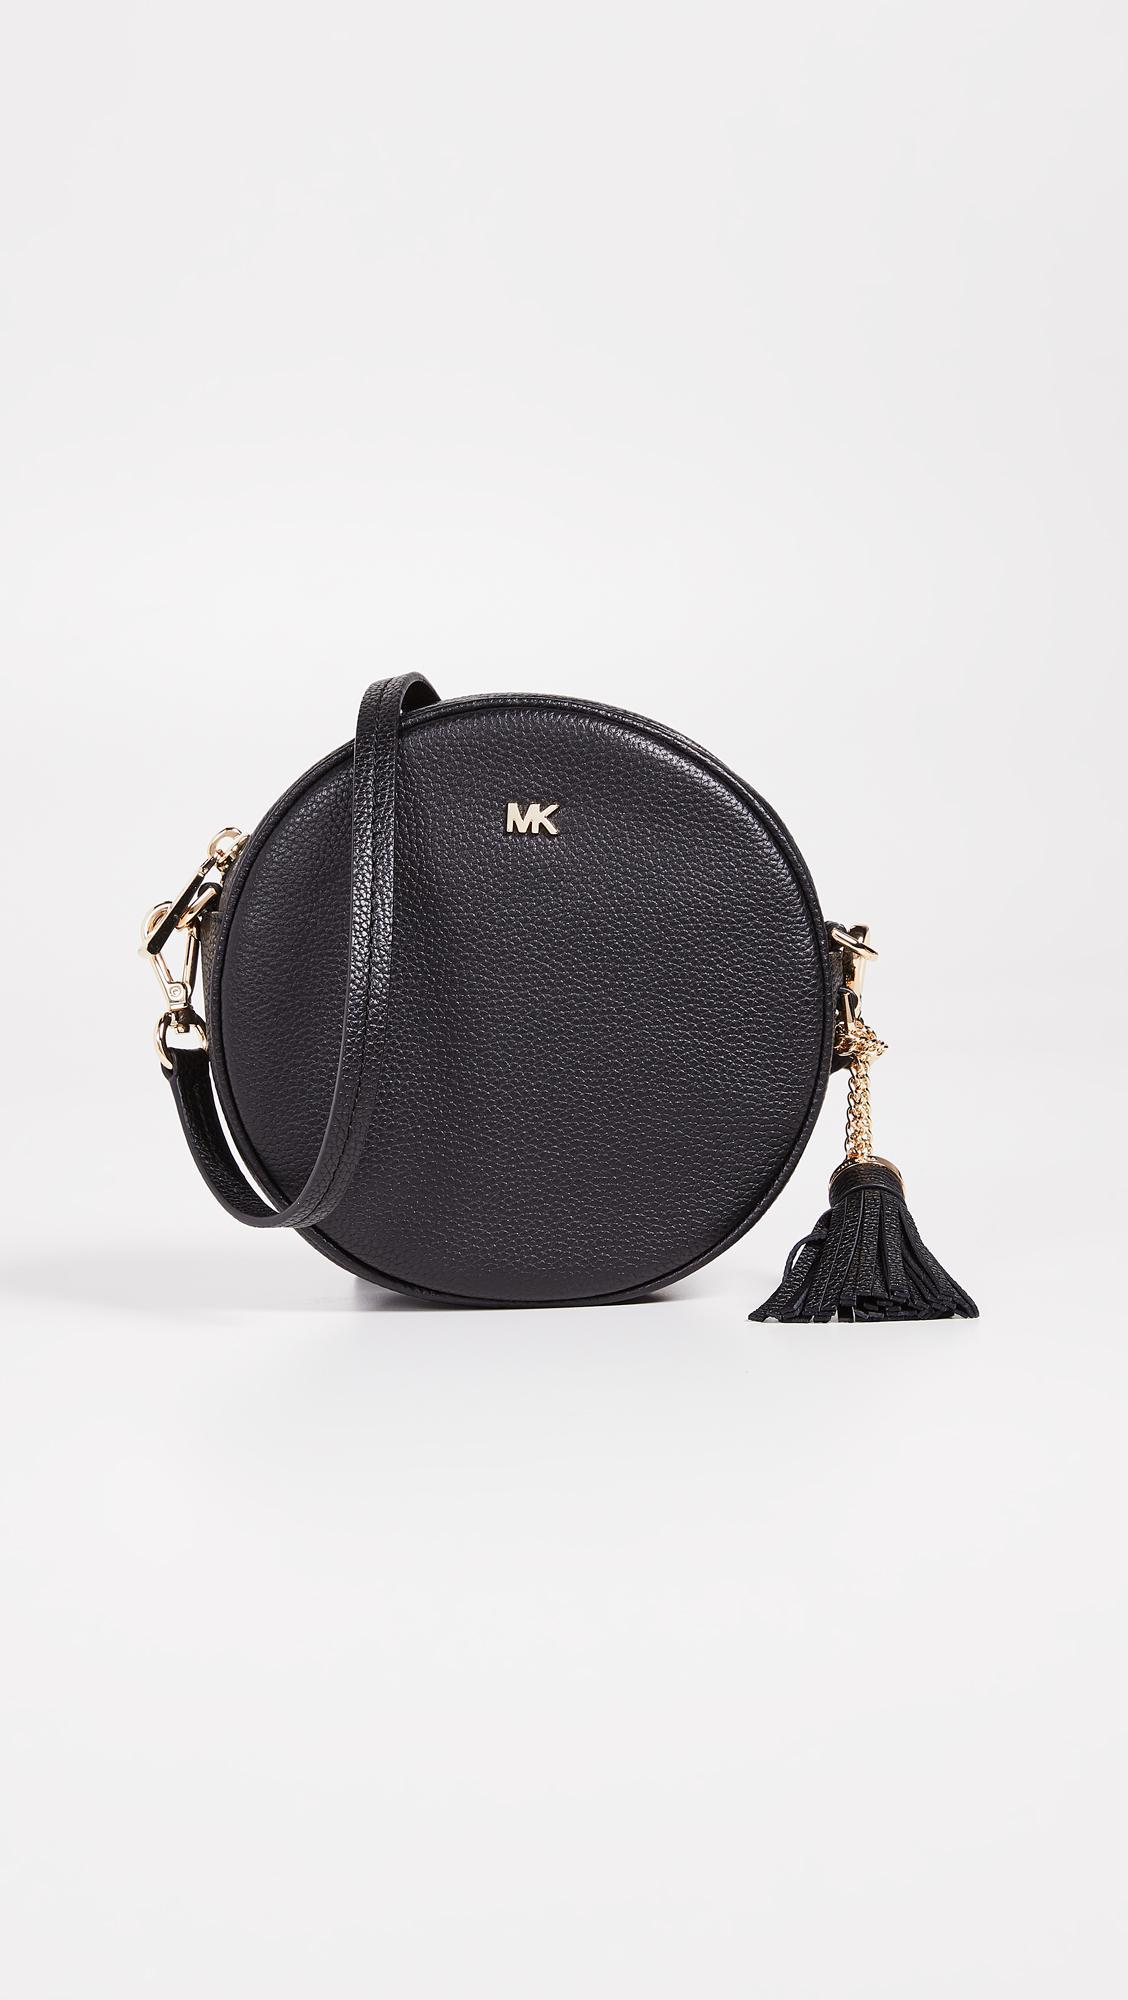 9be646a1200c Lyst - MICHAEL Michael Kors Medium Canteen Crossbody Bag in Black